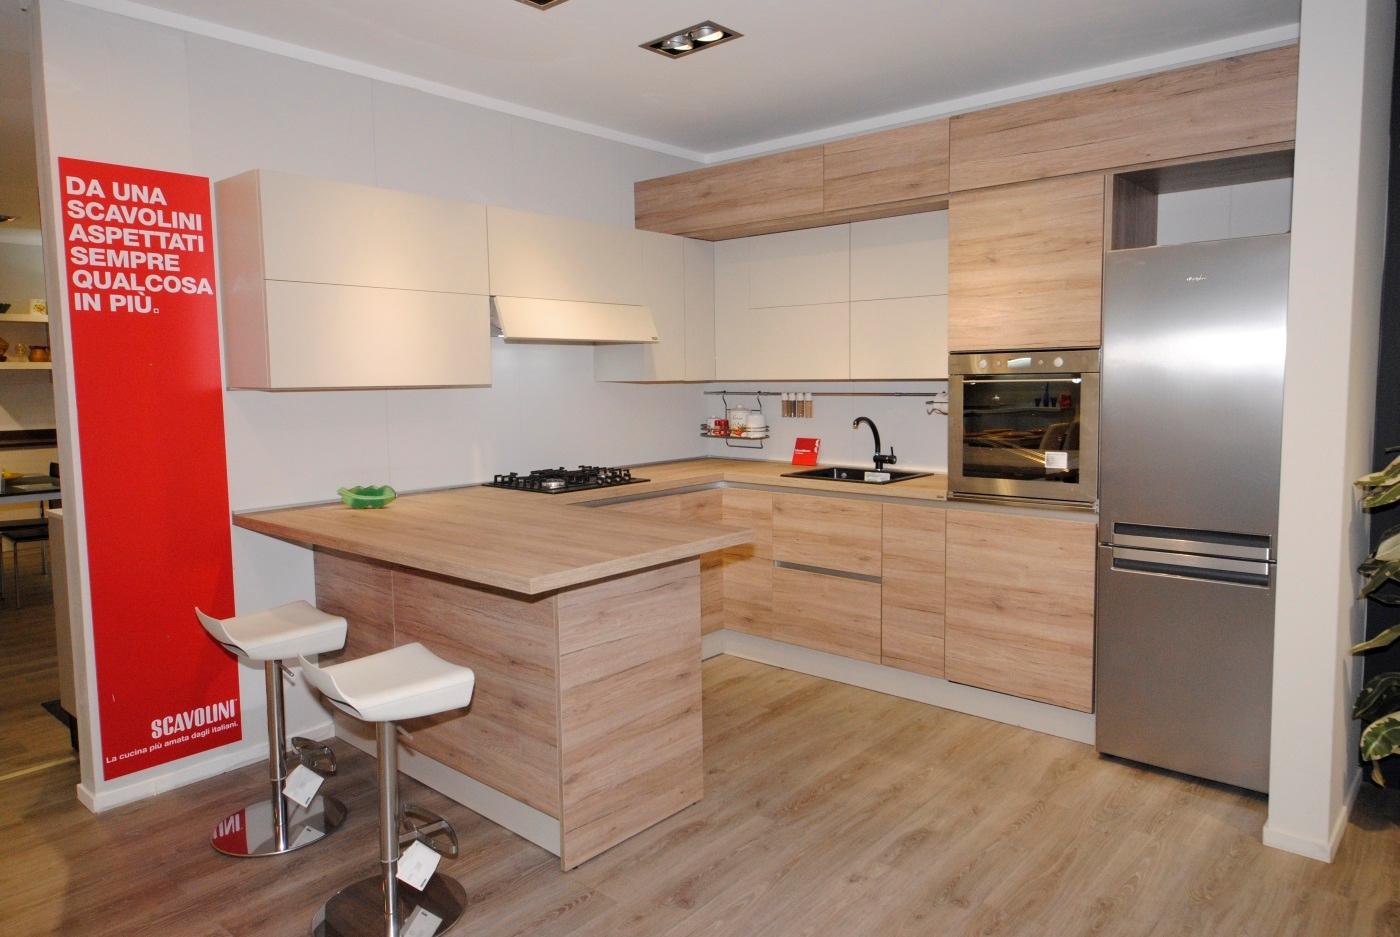 Cucina scavolini liberamente decorativo moderne cucine a for Outlet cucine moderne